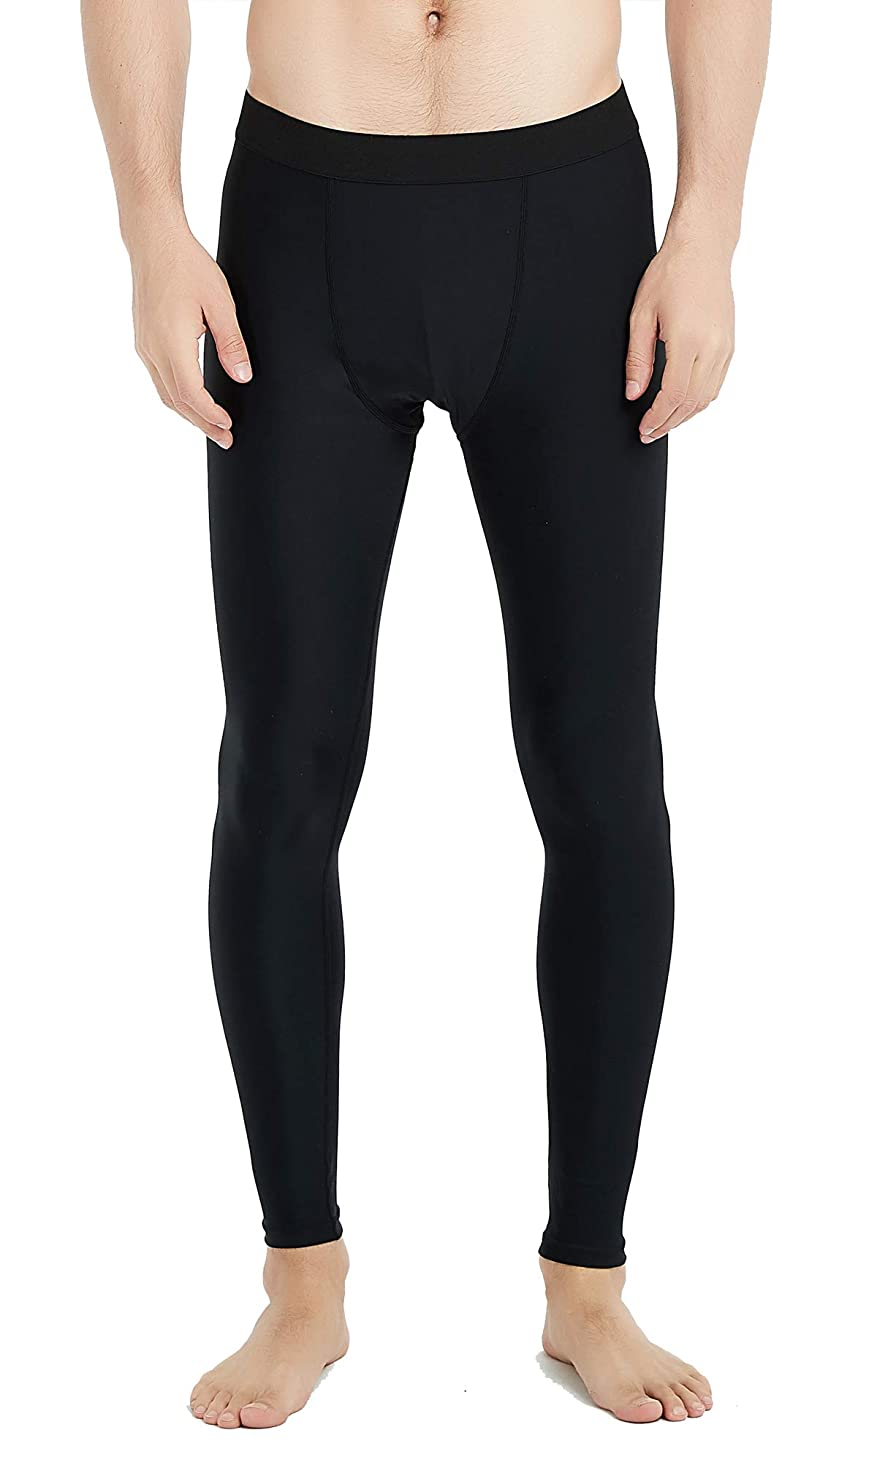 UPF 50+ Men's Surfing Leggings Sun Protection High-Waist Tummy Control Swimming Pants